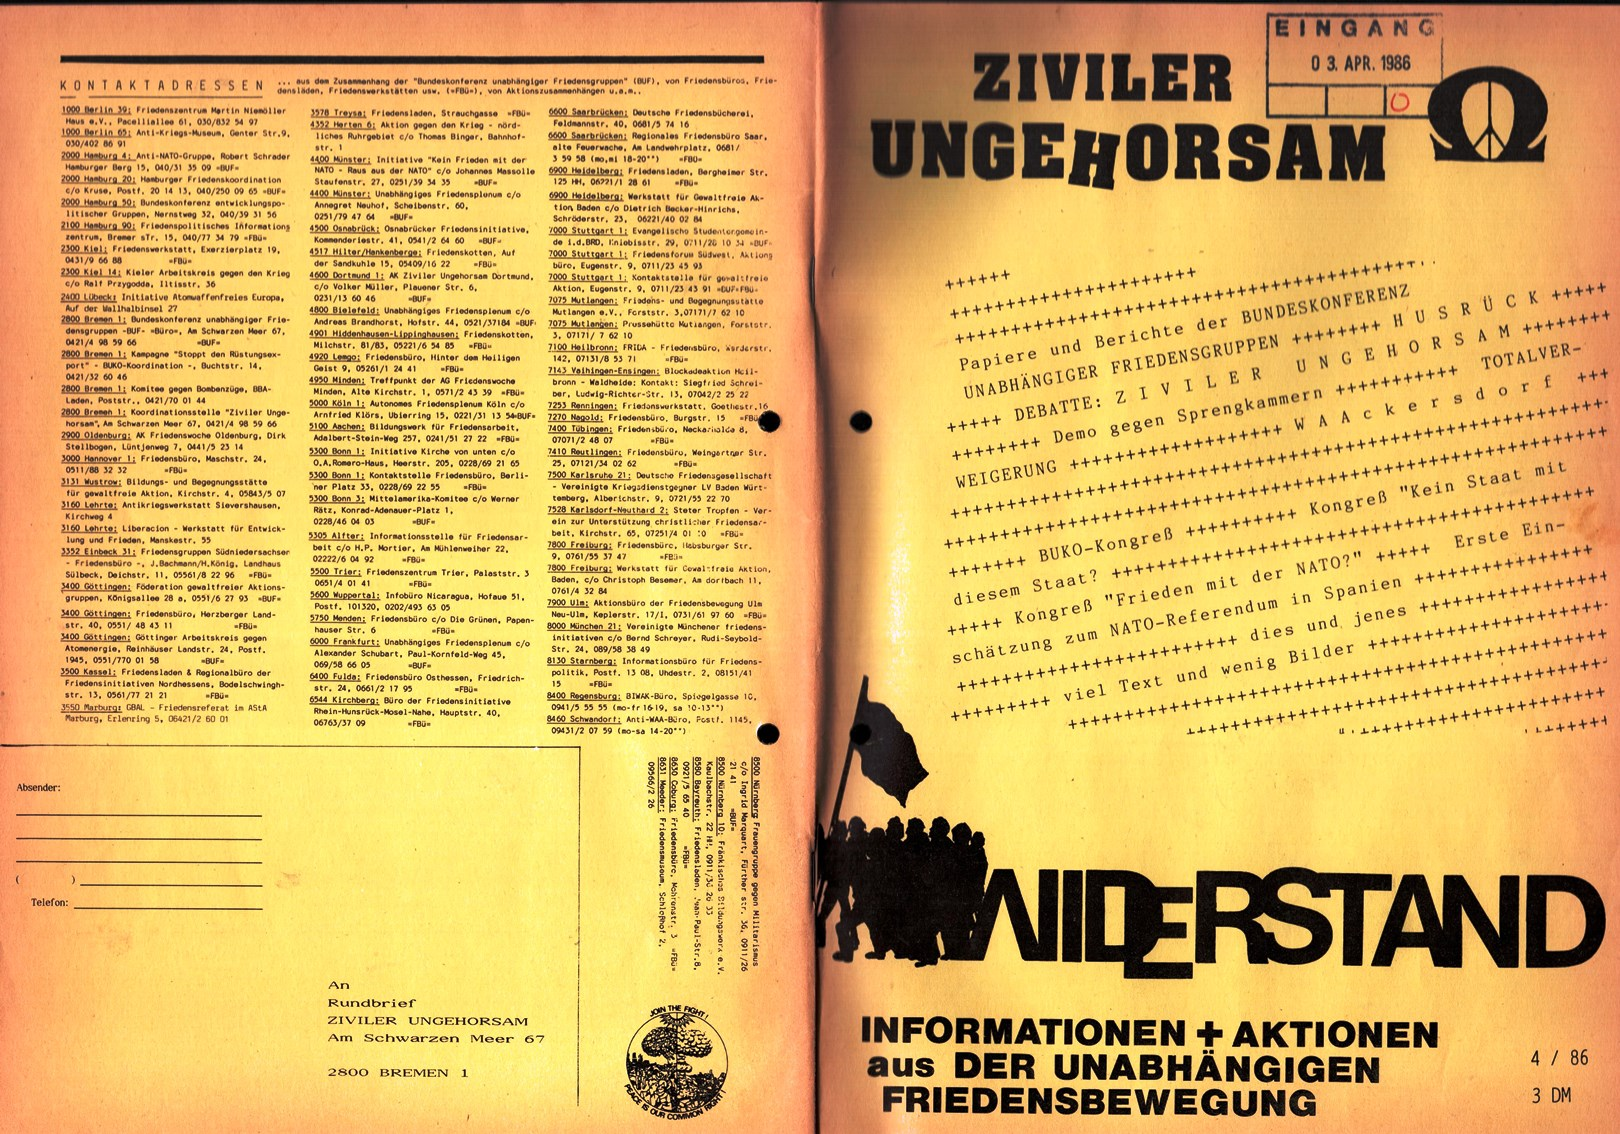 Ziviler_Ungehorsam_1986_004_001